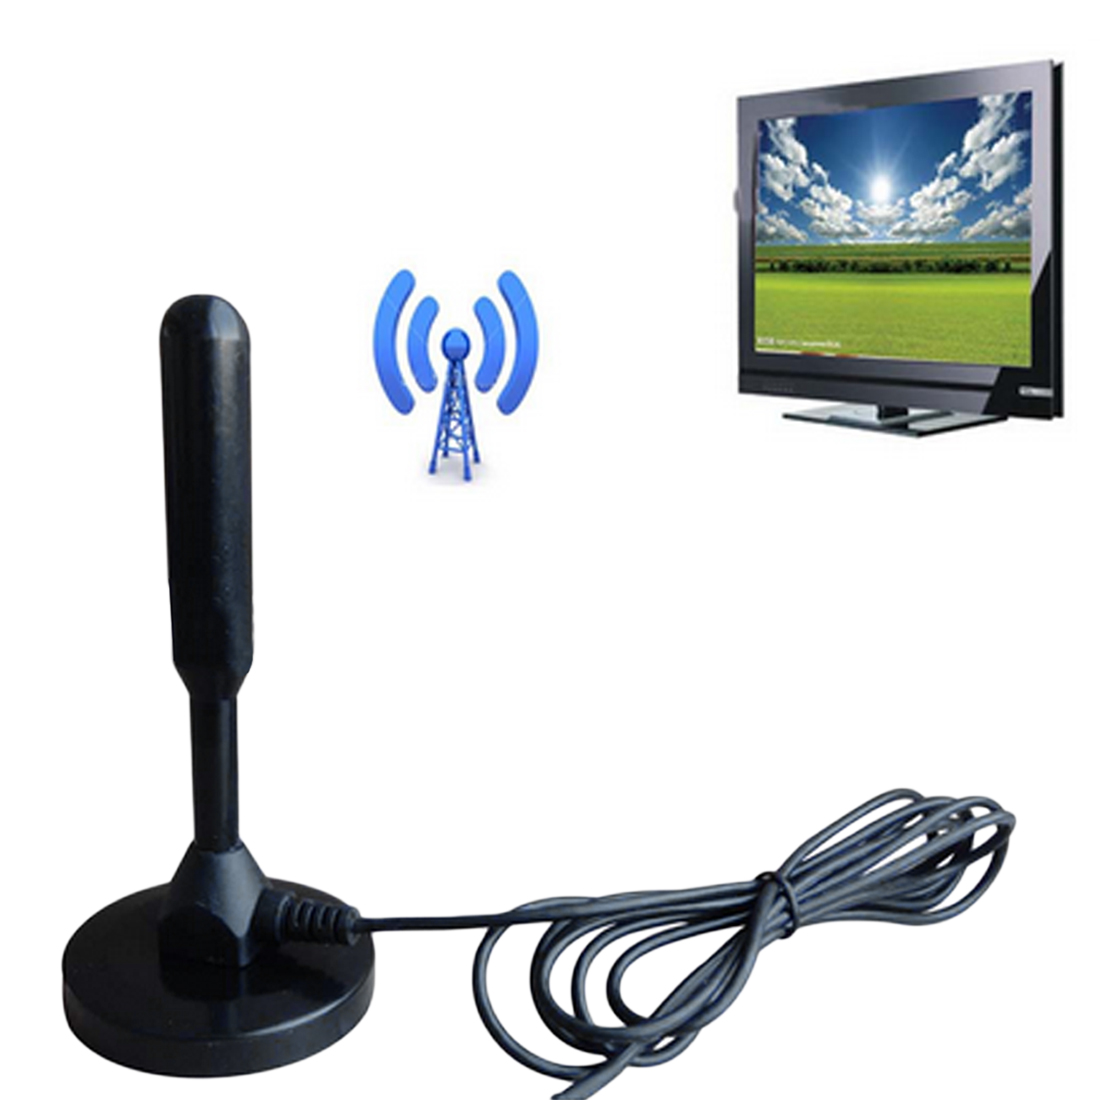 Marsnaska Neue Ankunft Indoor Gain 28dBi Digital DVB-T/FM Dvb-t Antenne Antenne PC für TV HDTV